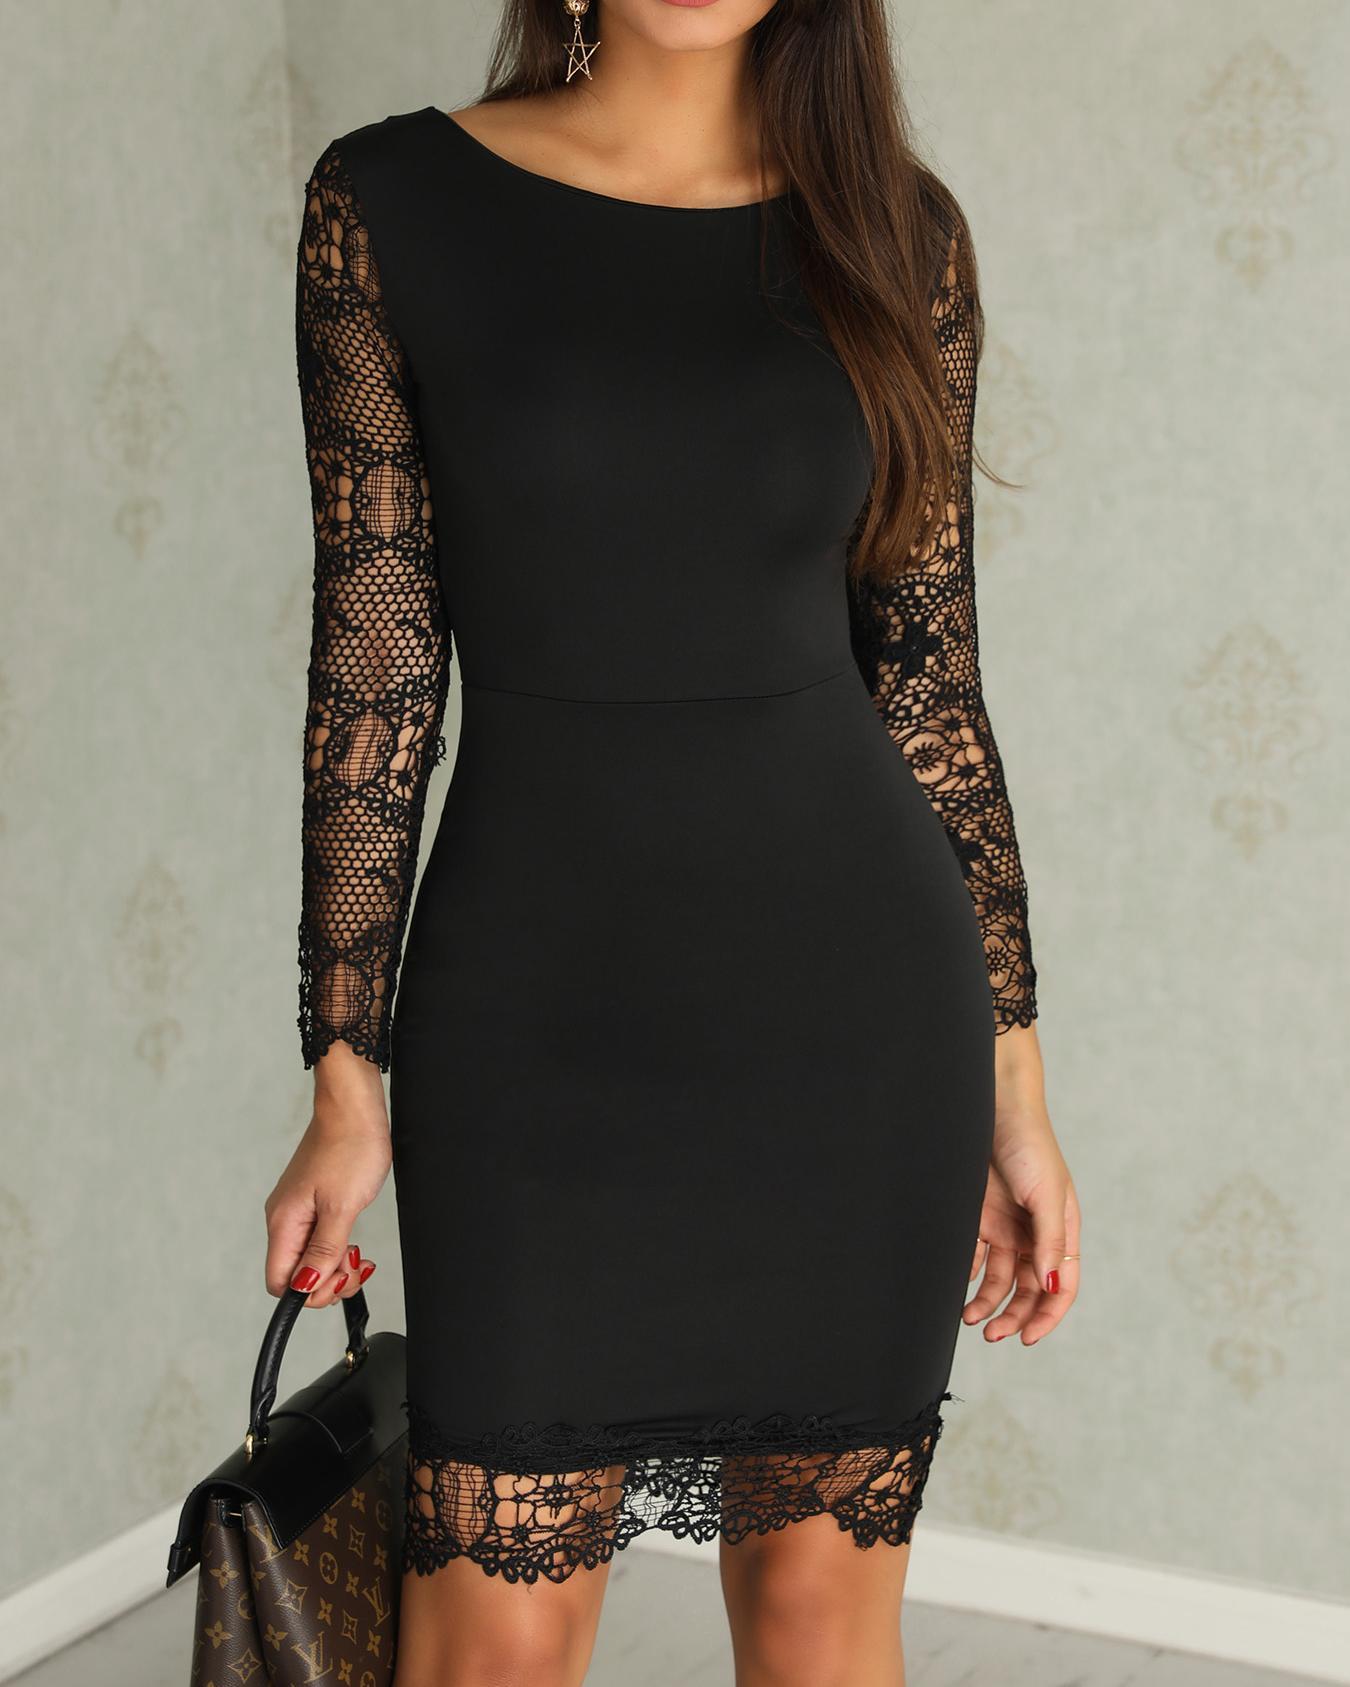 boutiquefeel / Oco out lace emenda vestido bodycon